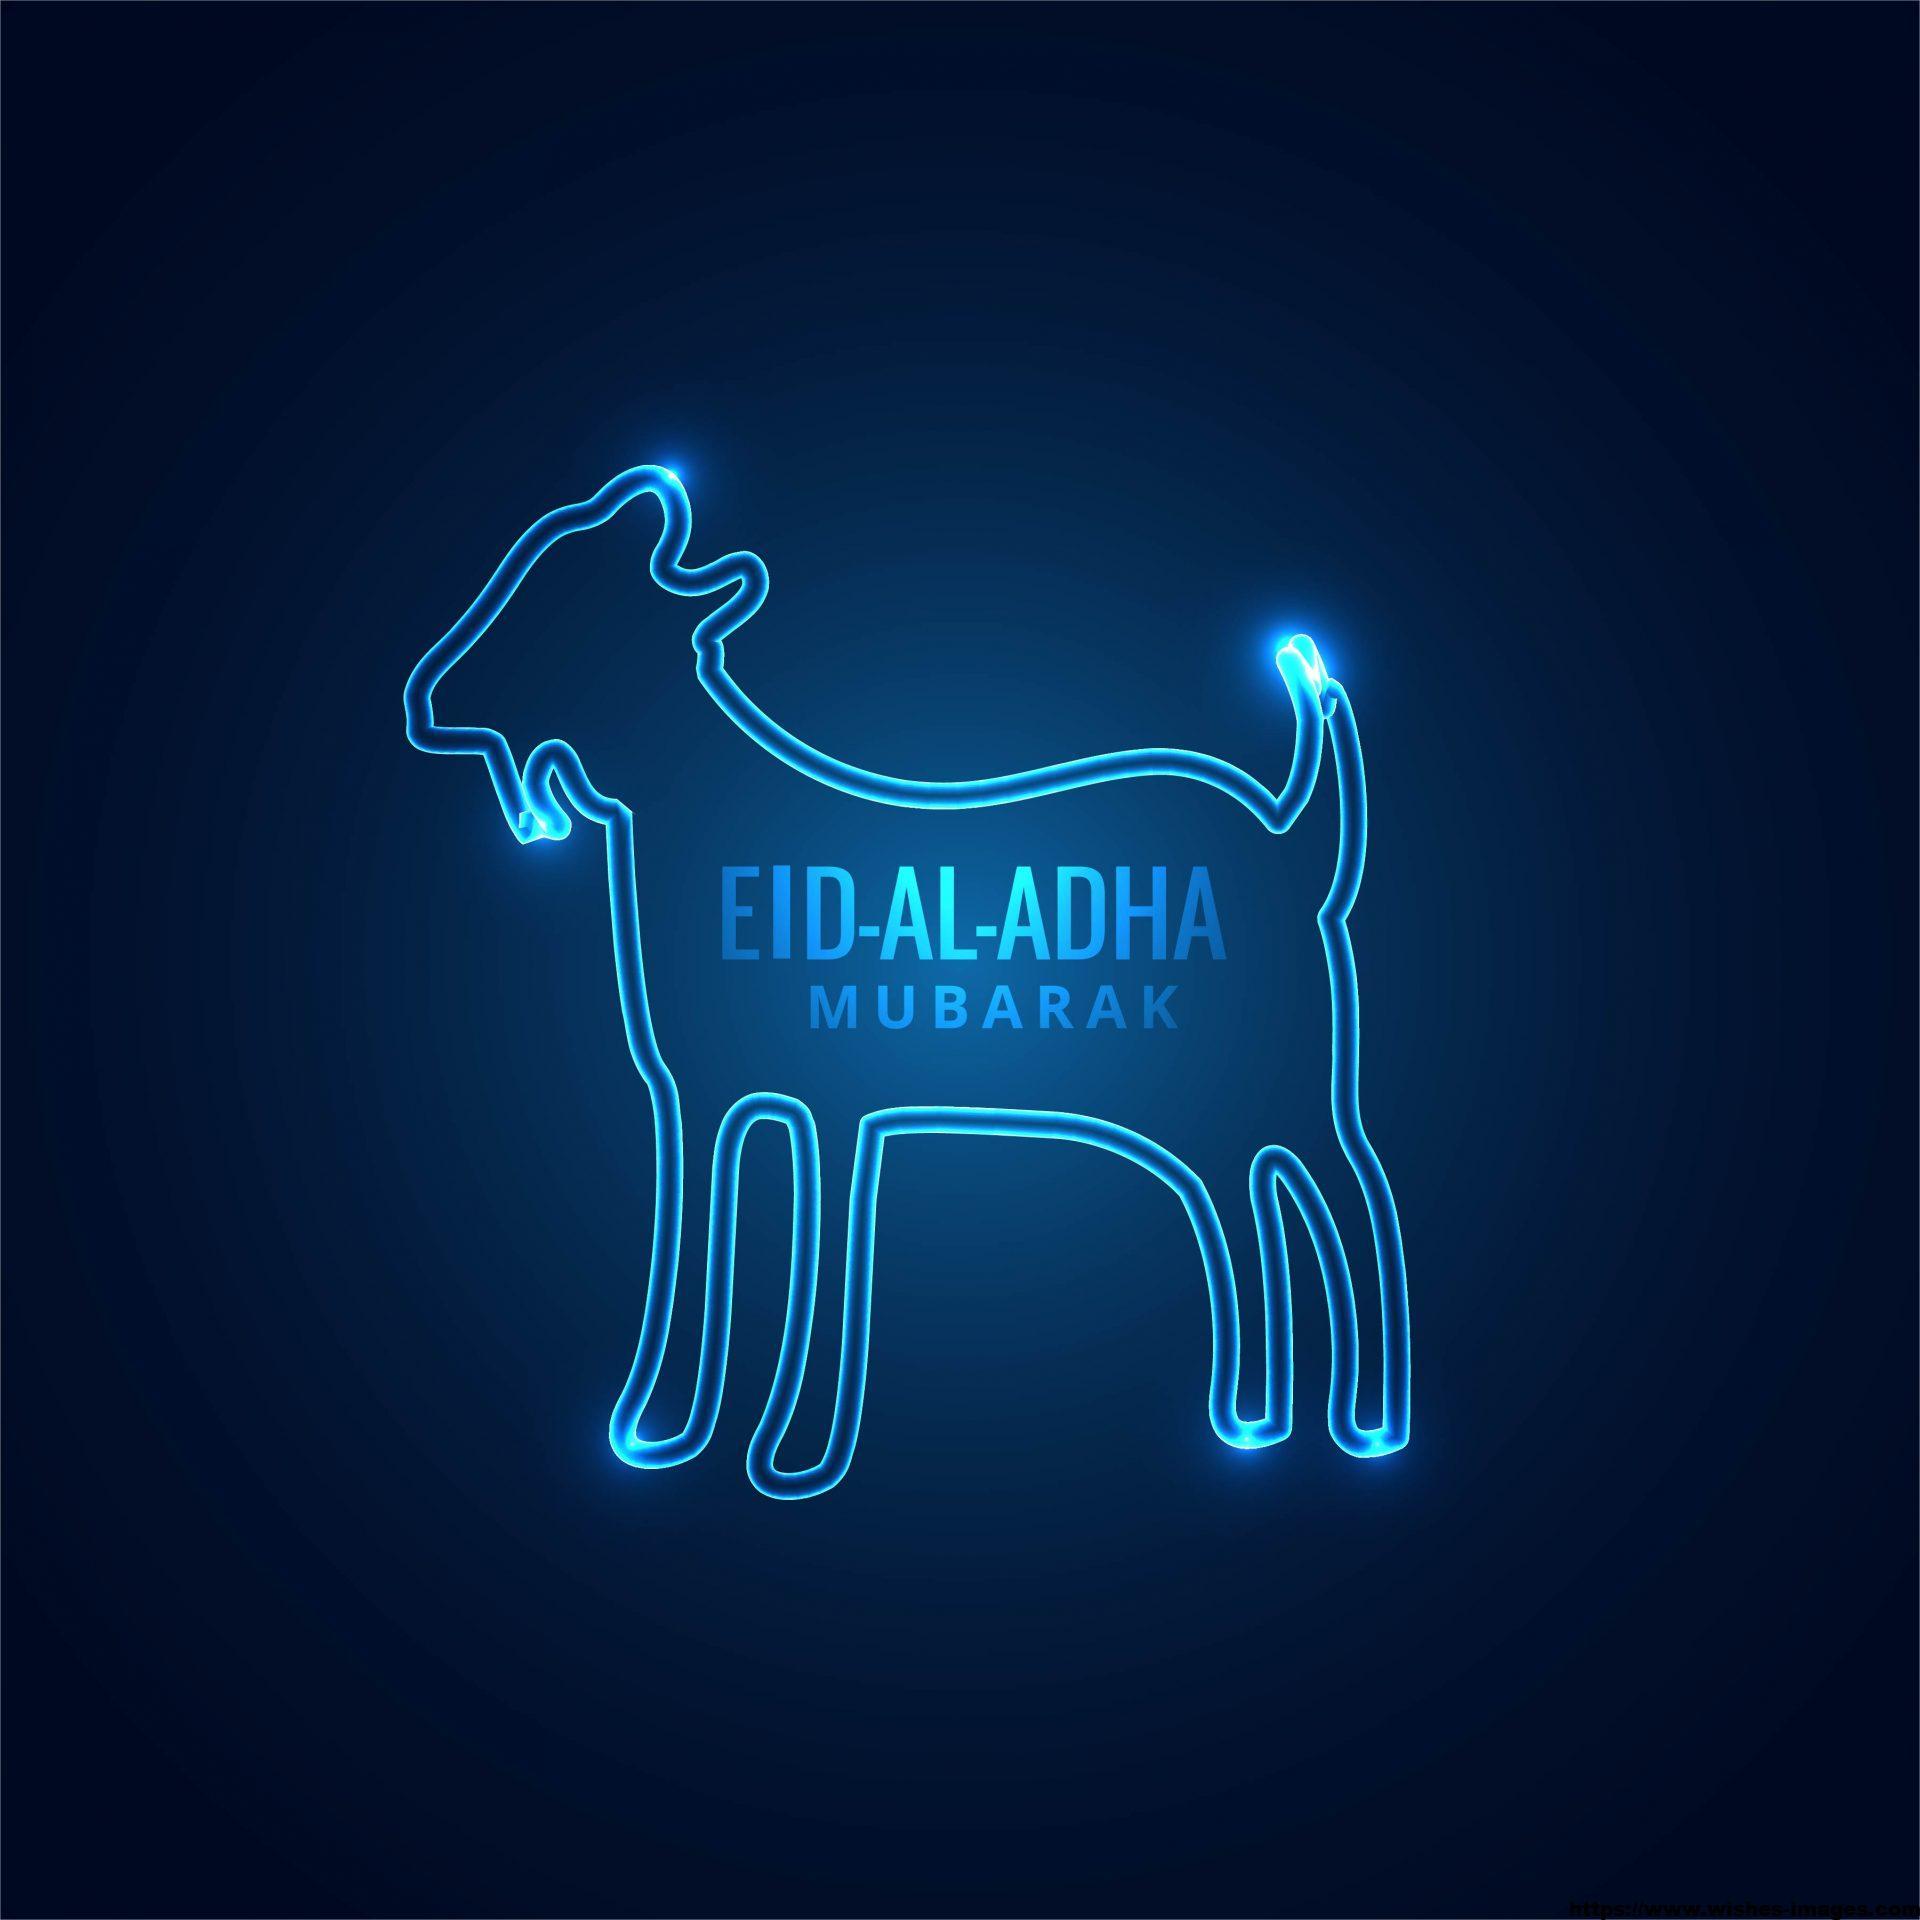 Eid Ul Adha Greetings Card Free Download